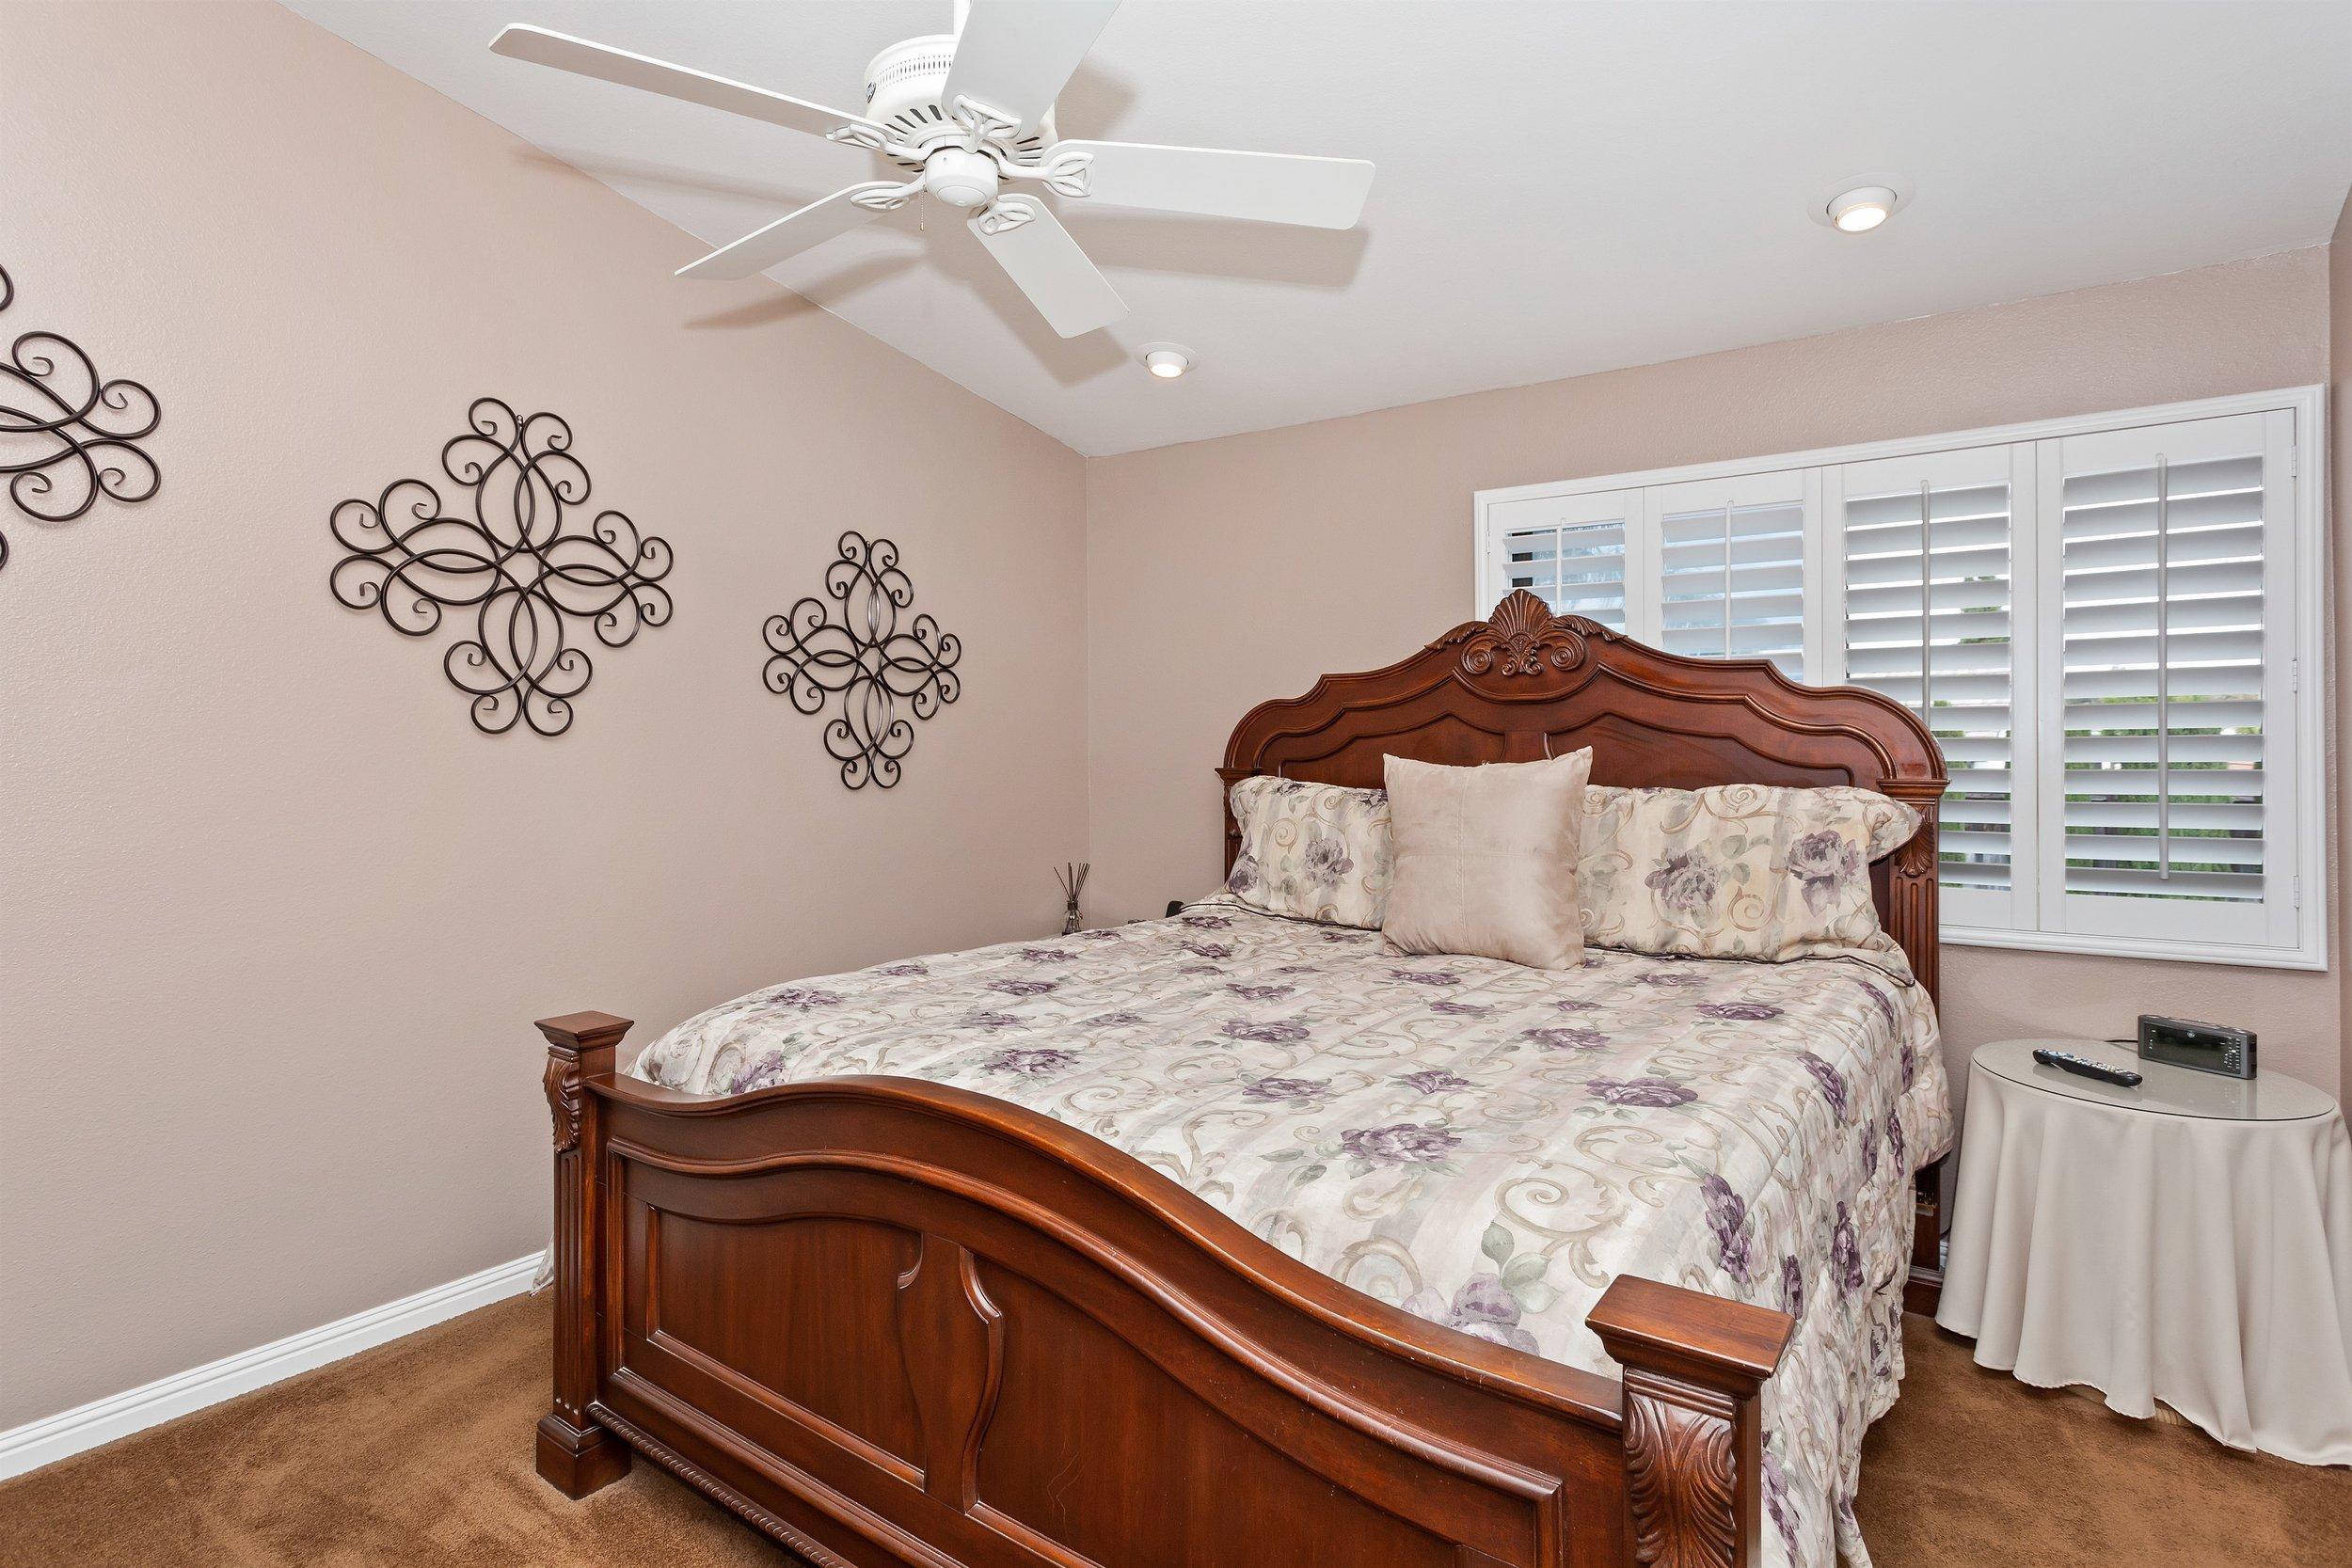 021_2nd Floor Master Bedroom.jpg